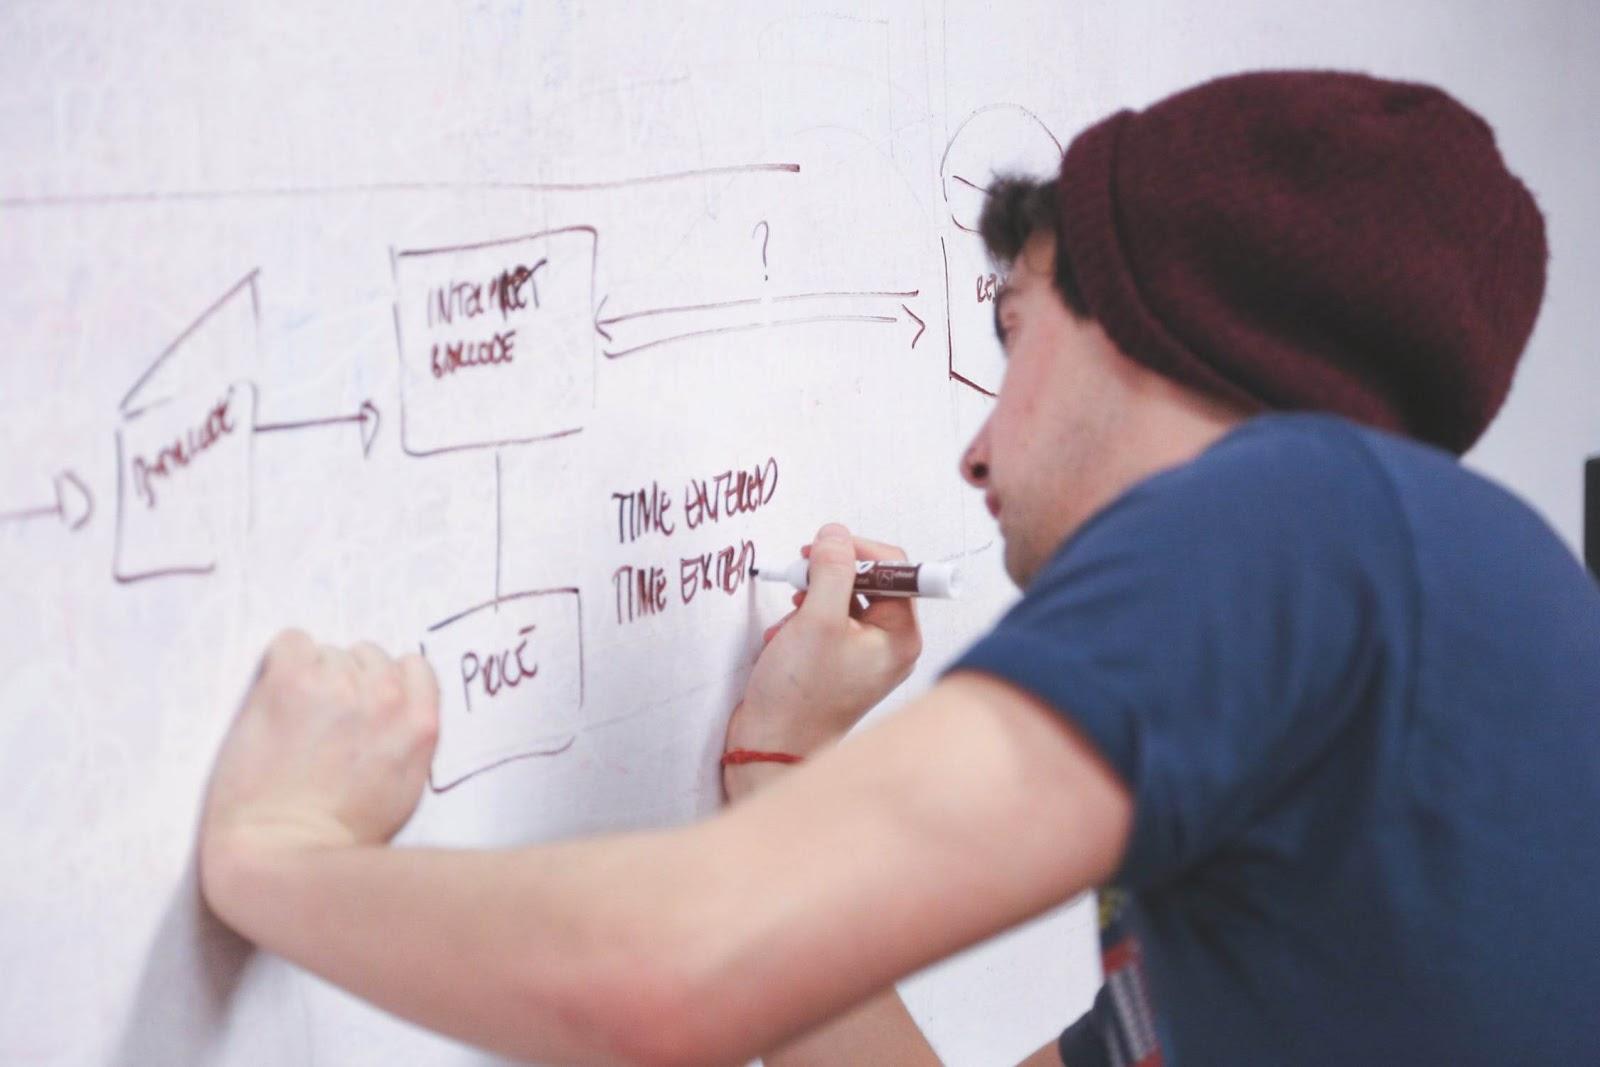 Man creating instagram marketing strategy on whiteboard.